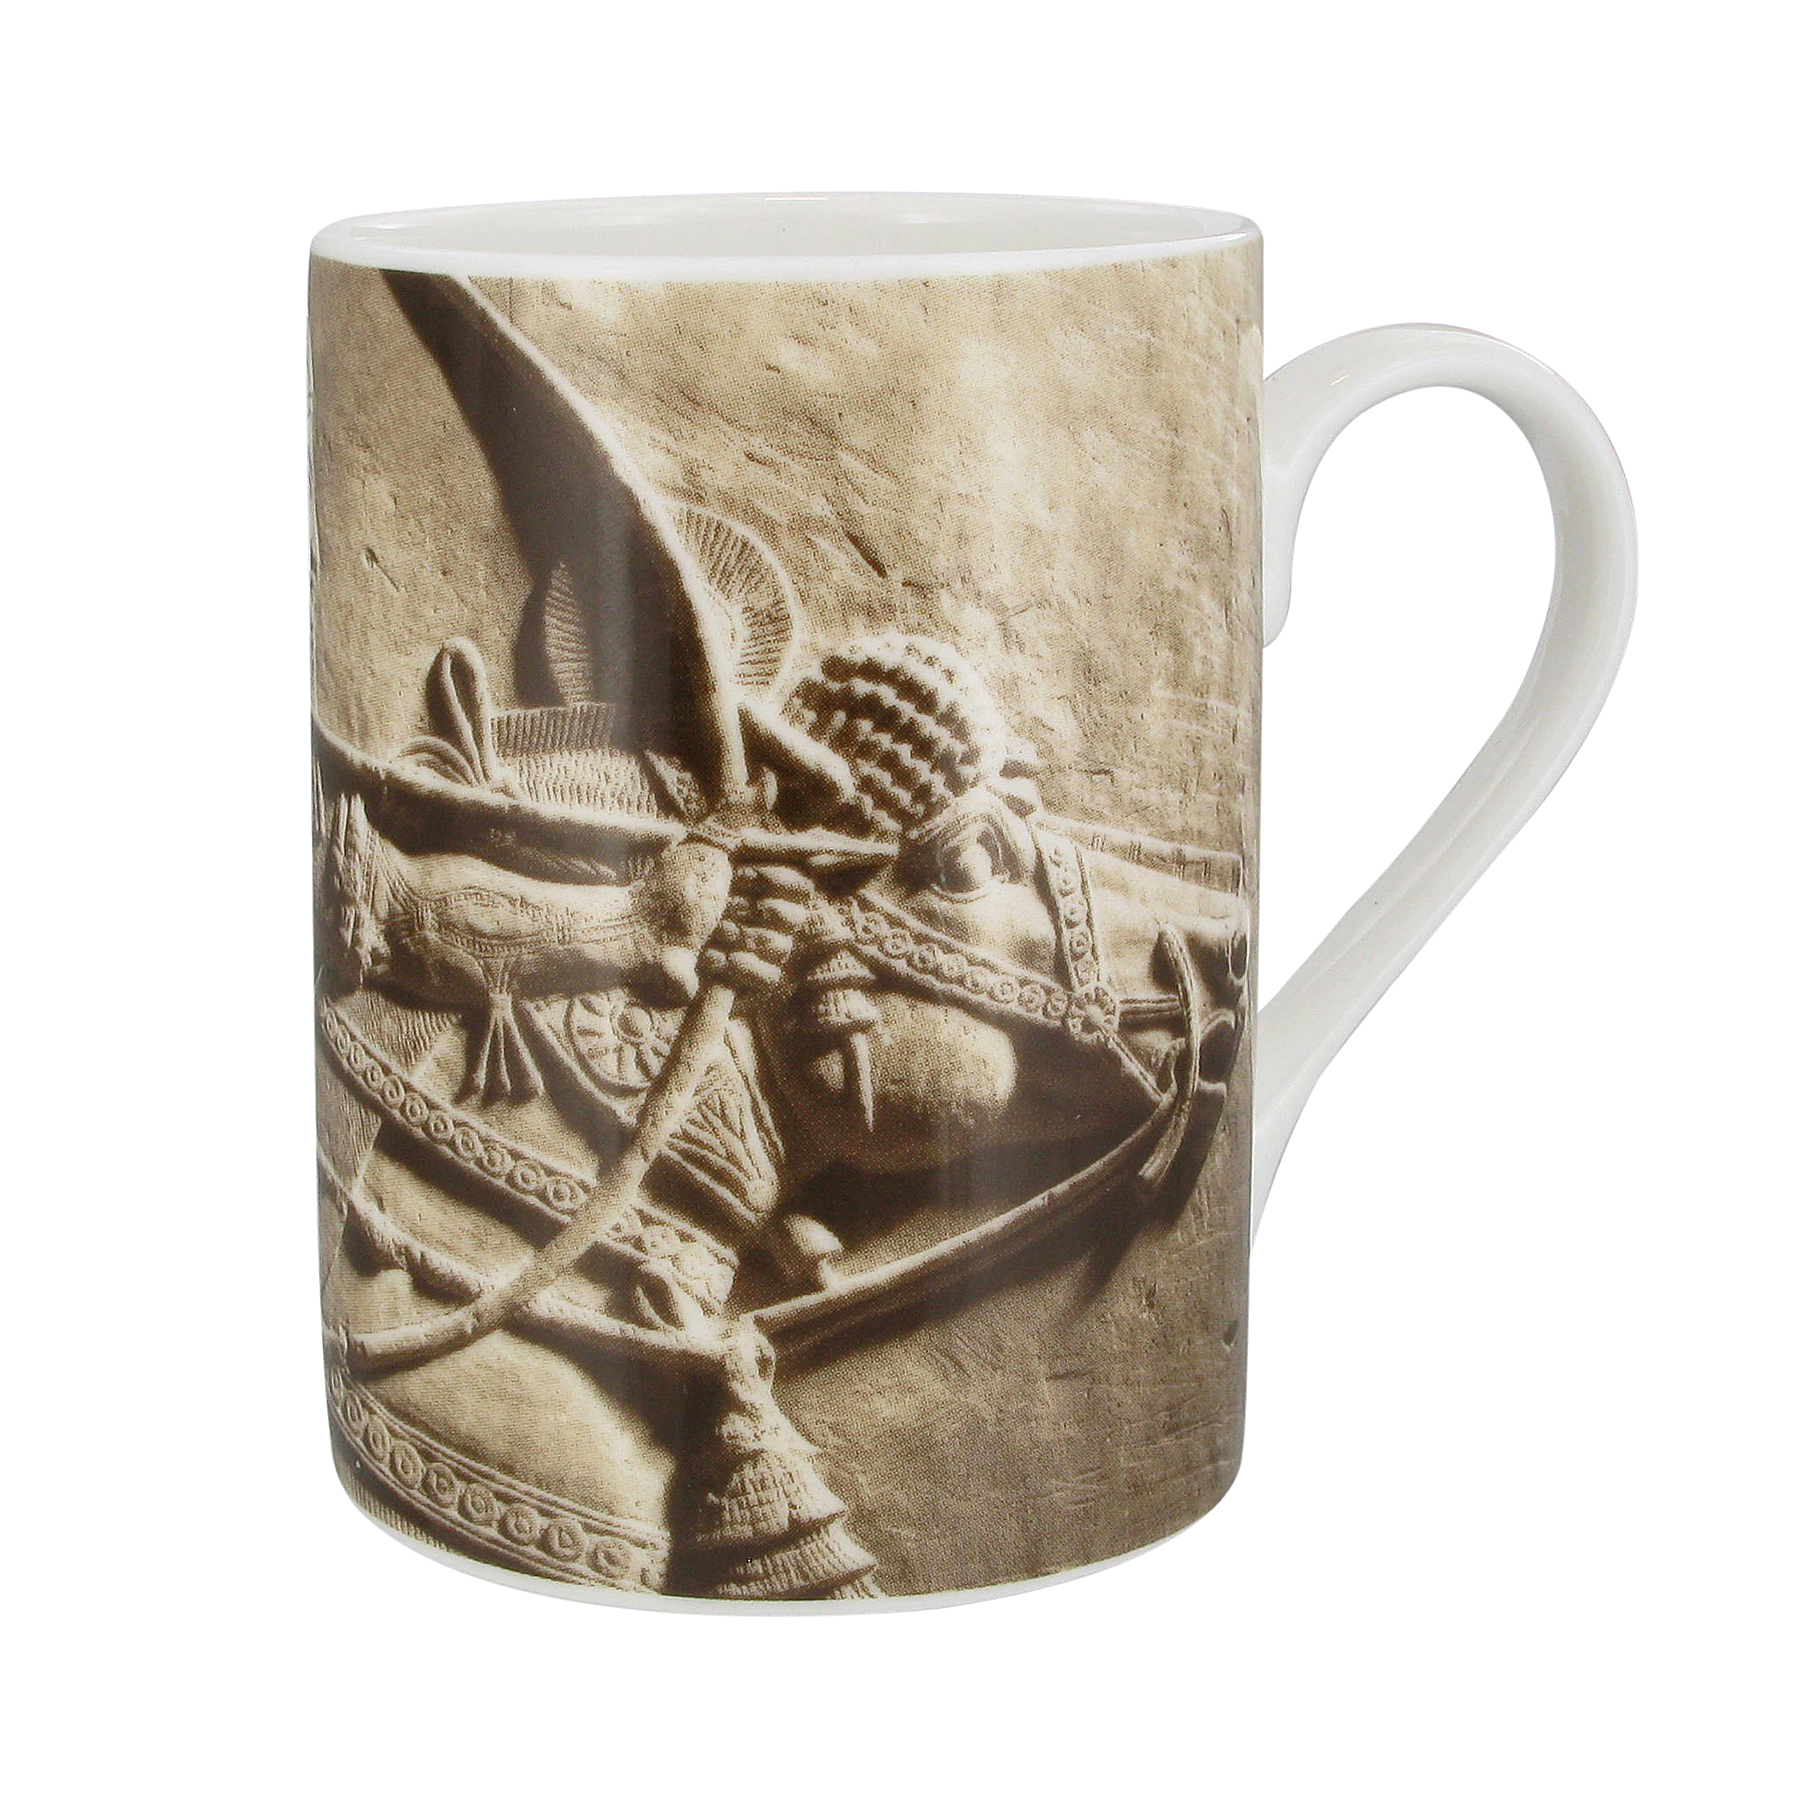 Ashurbanipal mug